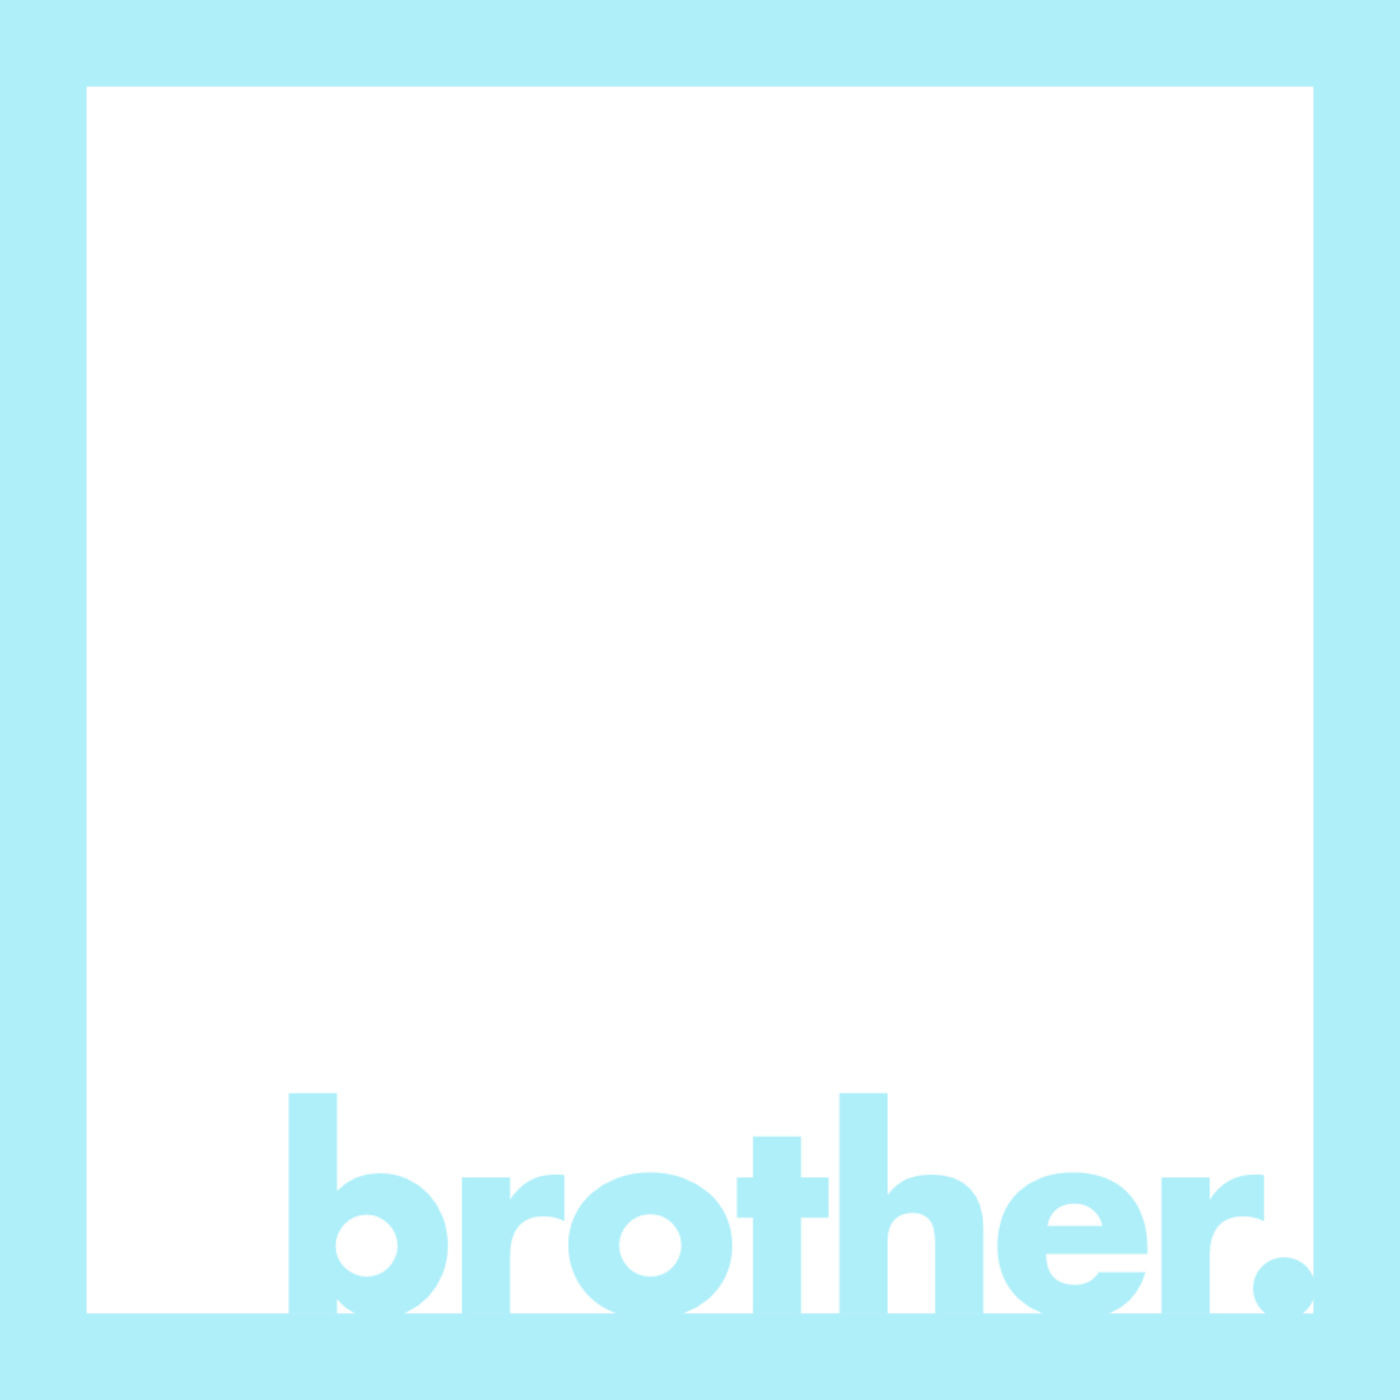 Brother: Episode 5 - The Taz Wears Prada